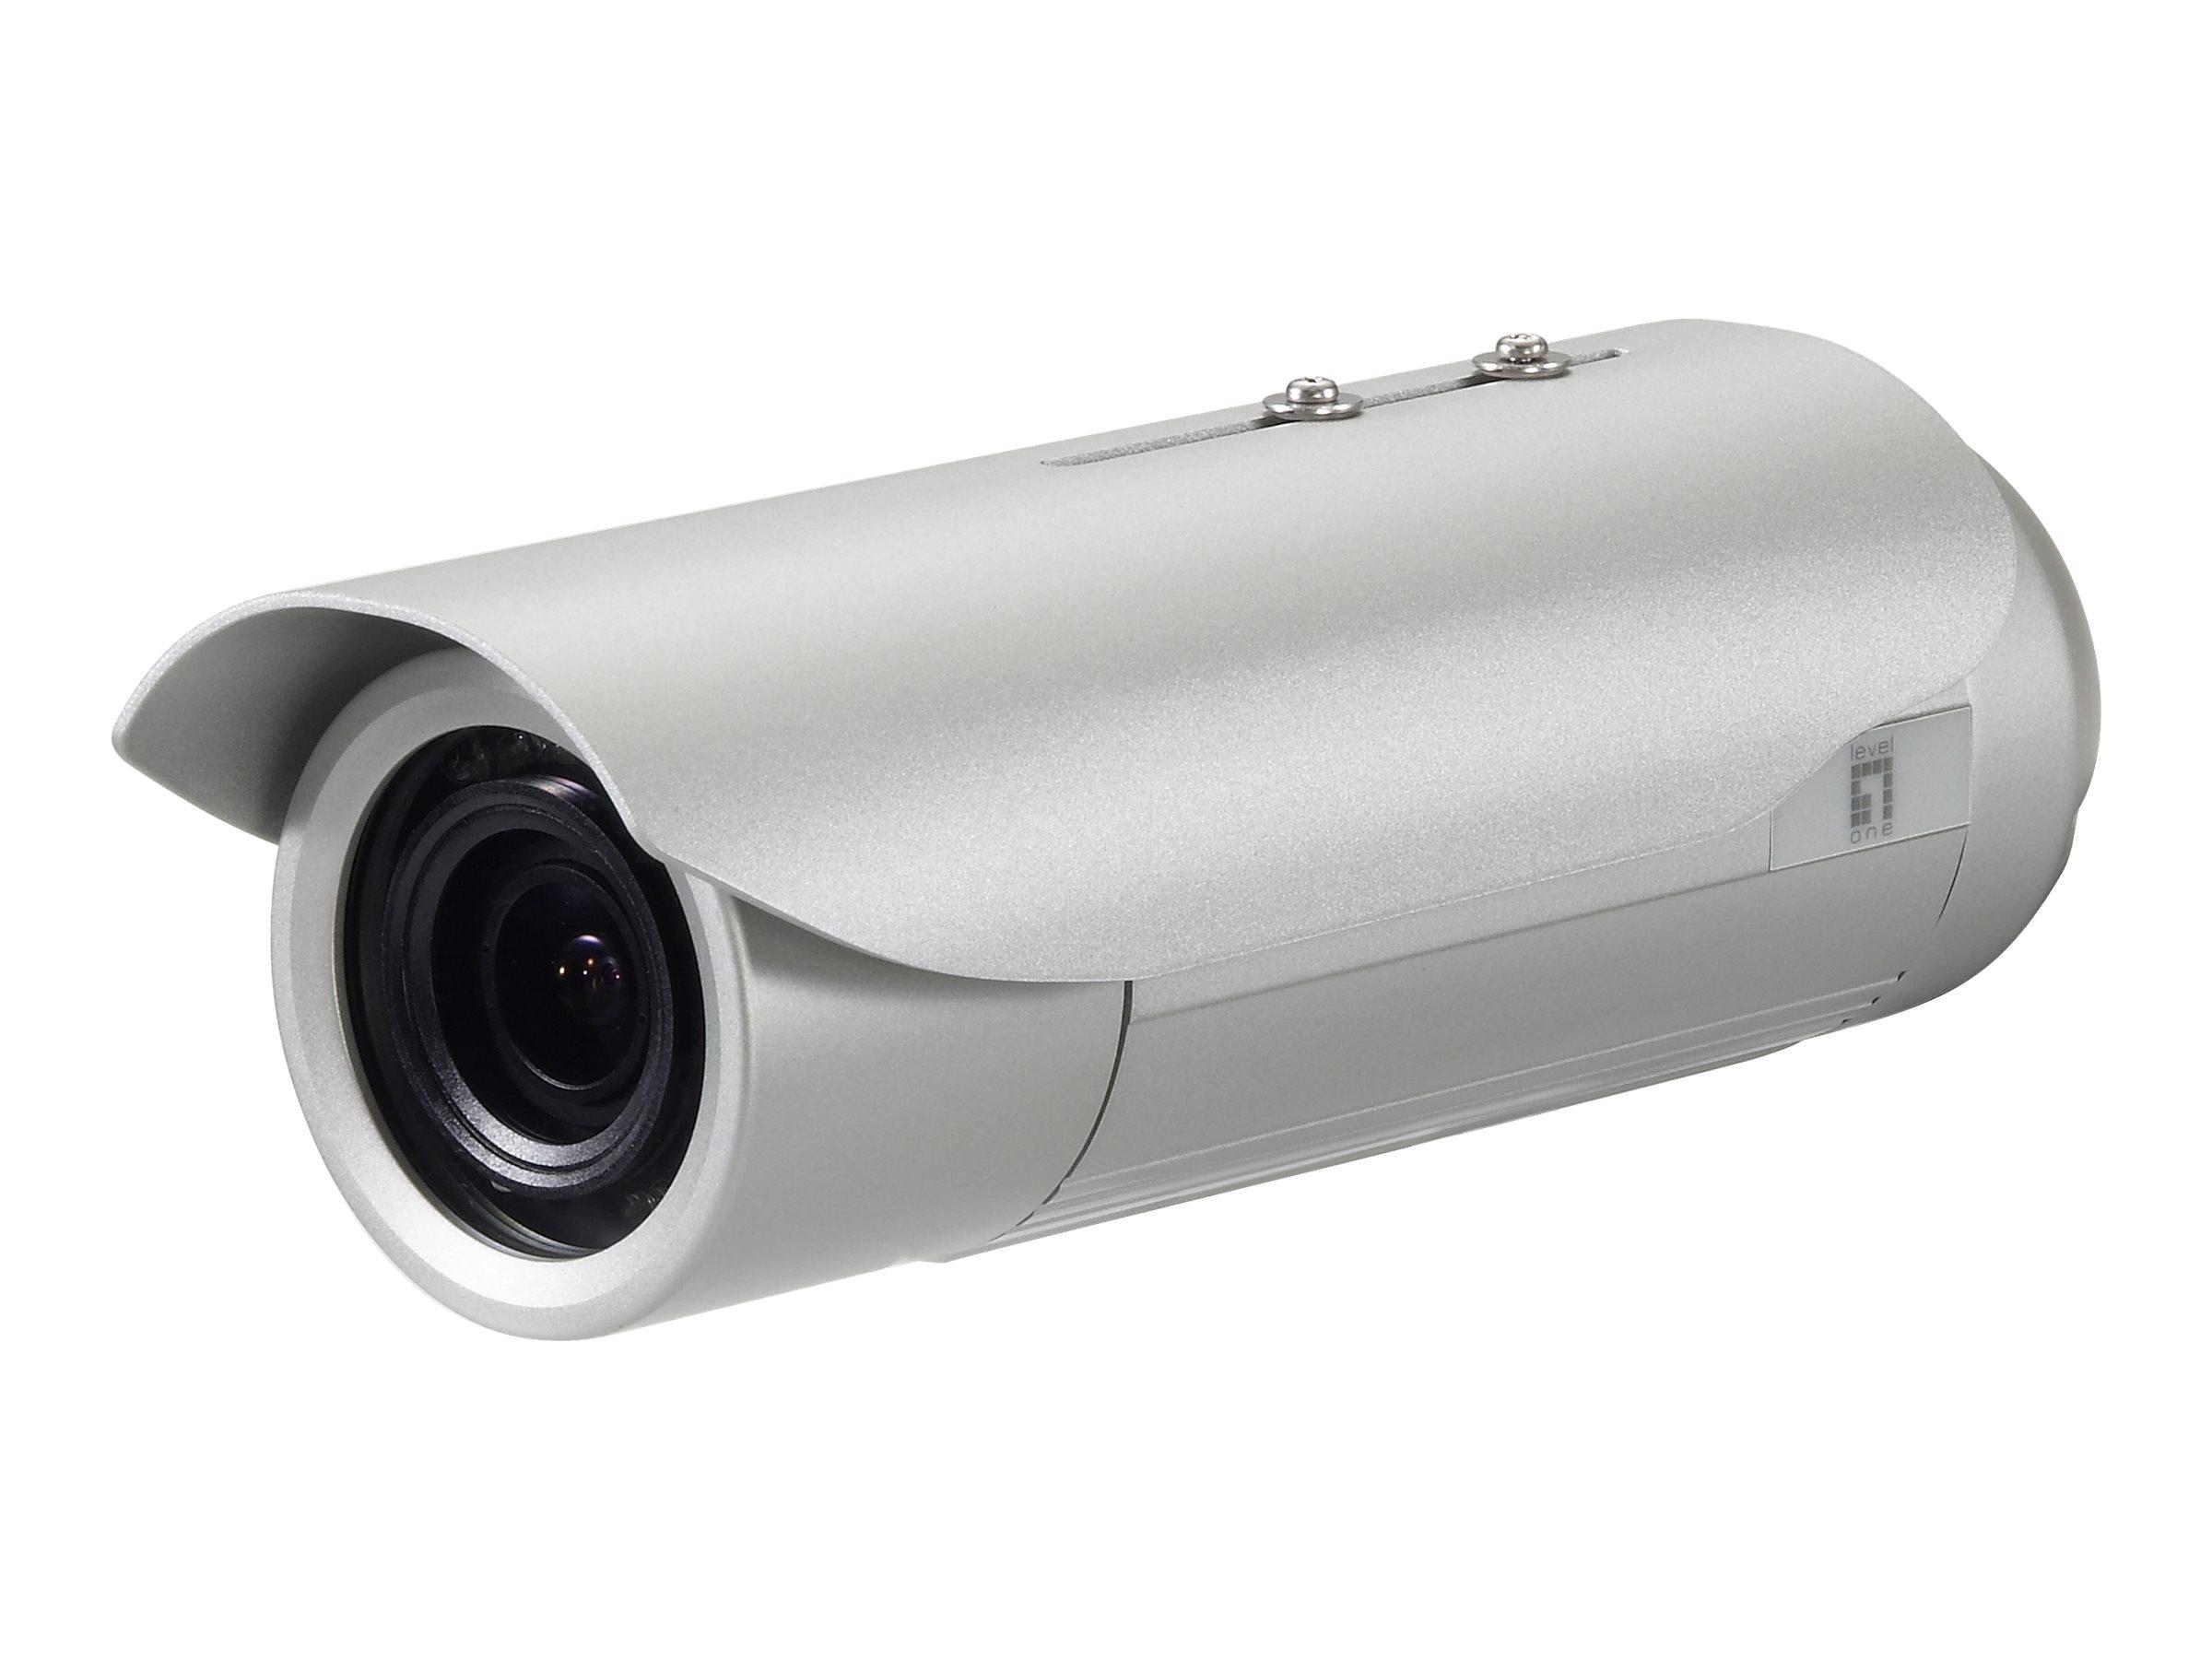 LevelOne FCS-5057 - network surveillance camera